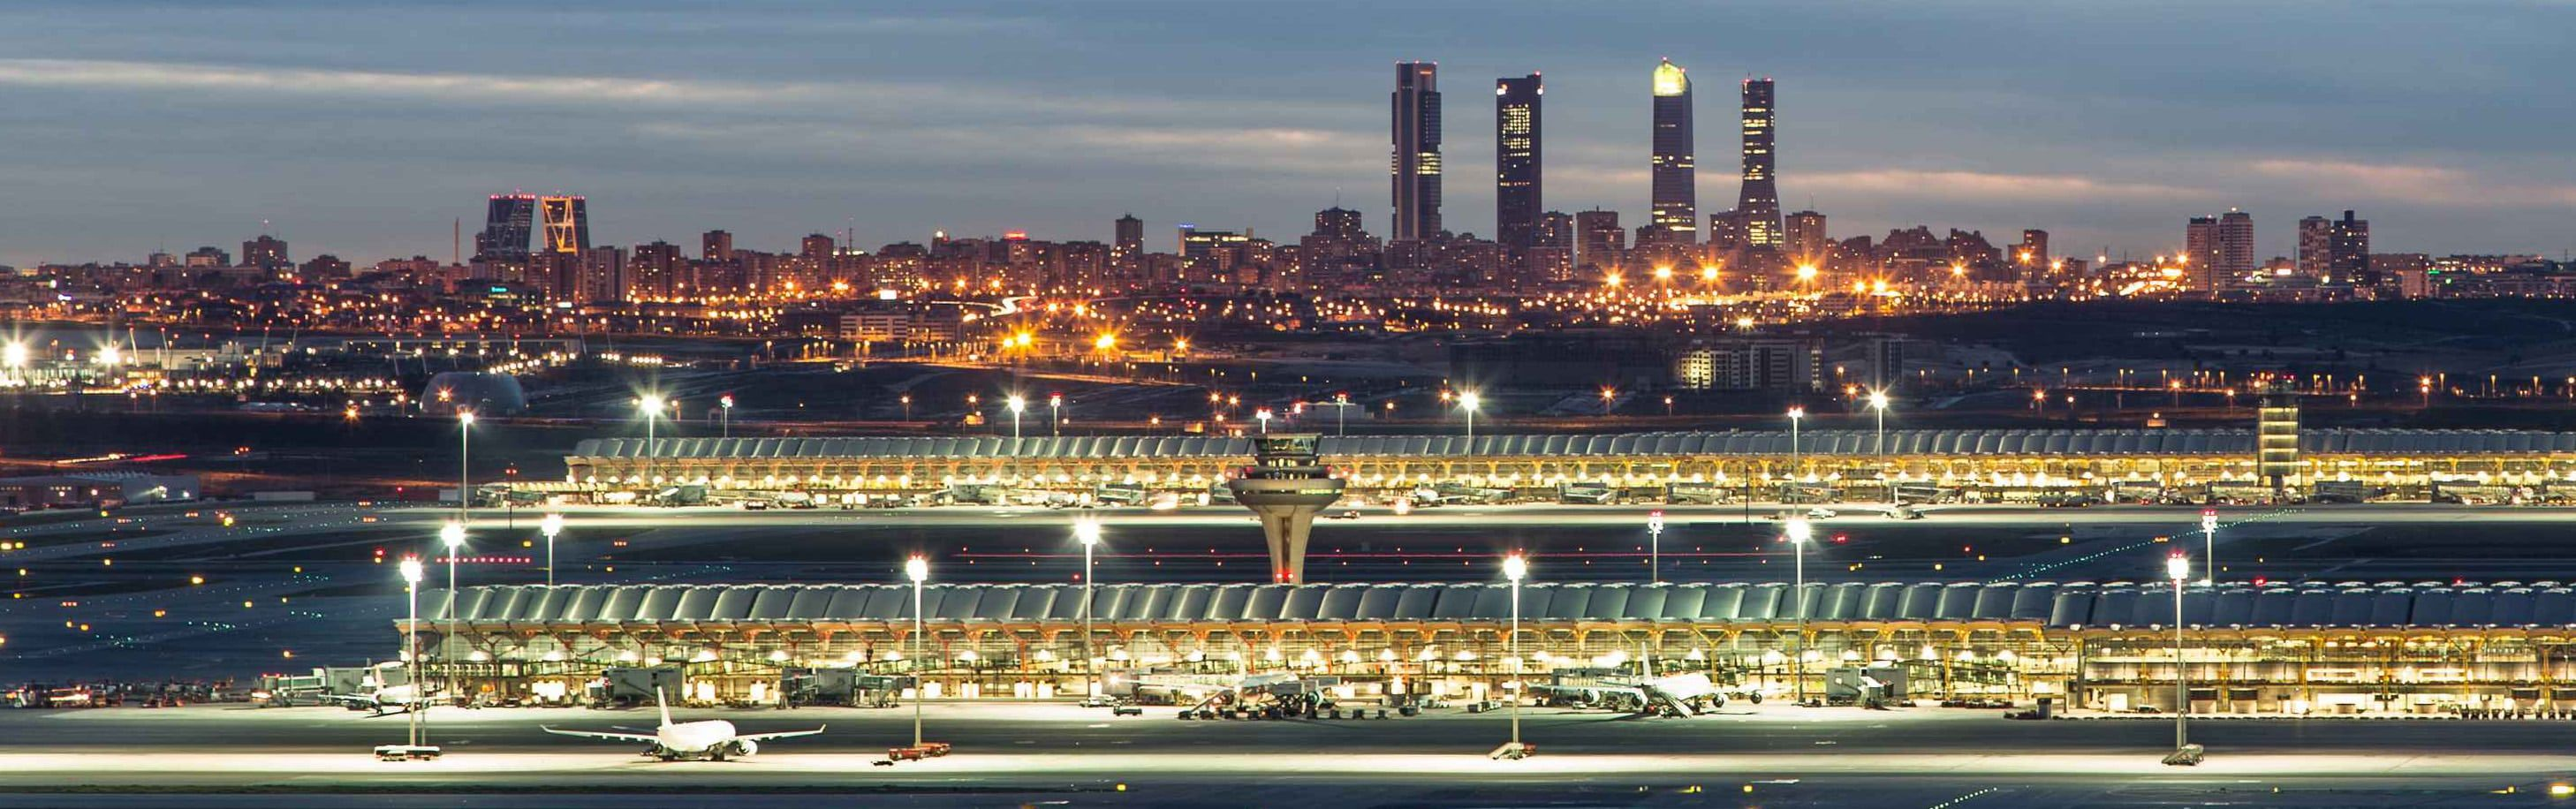 Foto encabezado aeropuerto Madrid